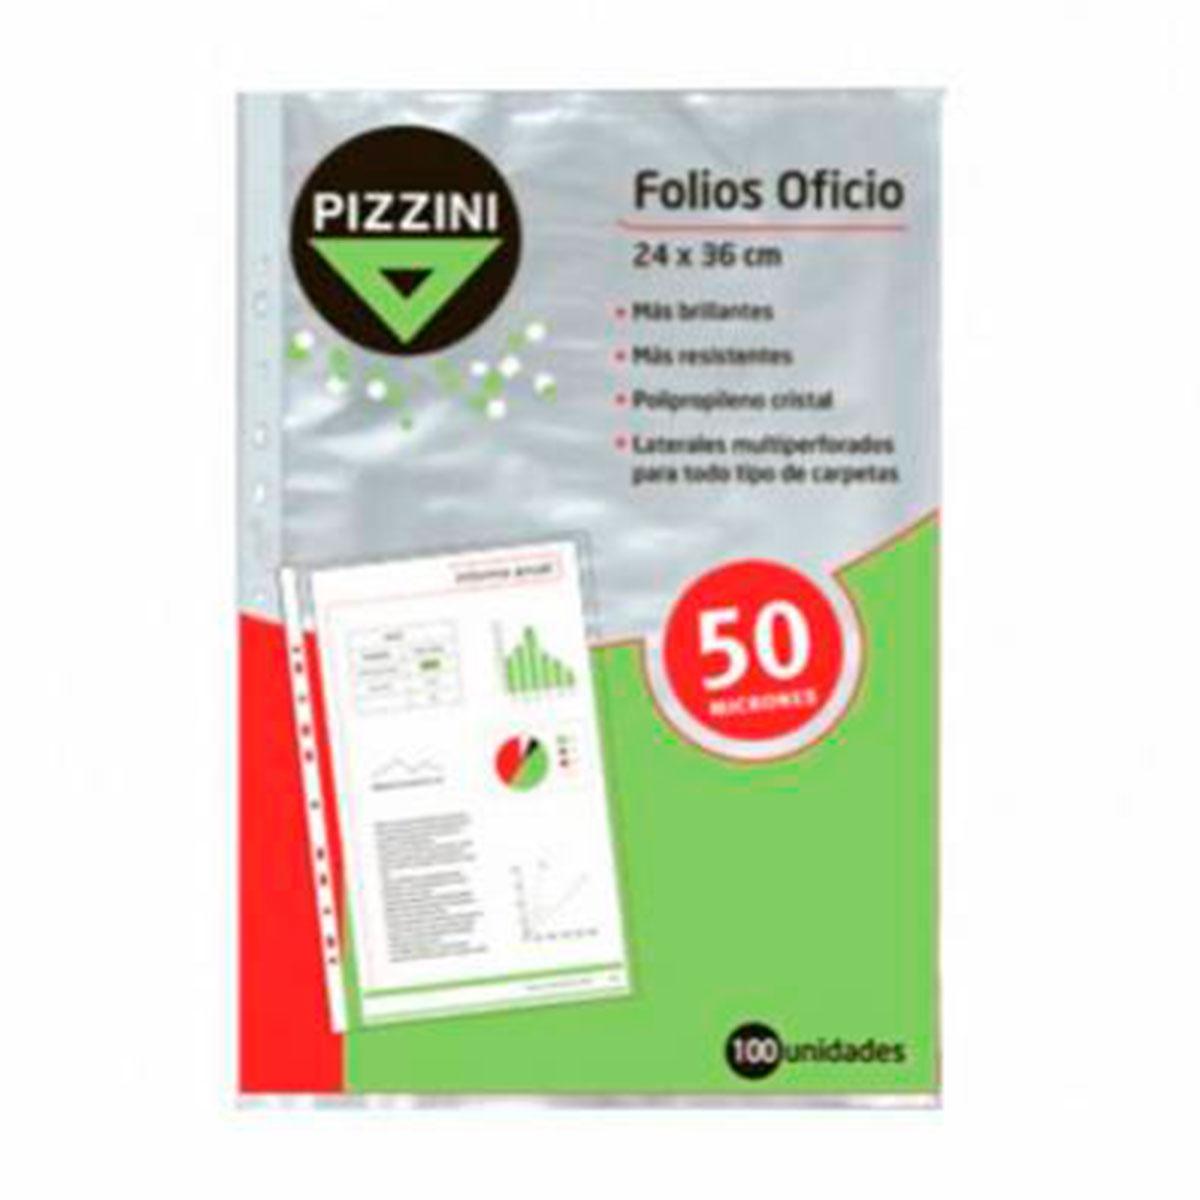 50FOX100 PIZZINI                                                      | FOLIOS OFICIO 24X36CM POLIPROPILENO 50 MICRONES X 100 UNIDADES